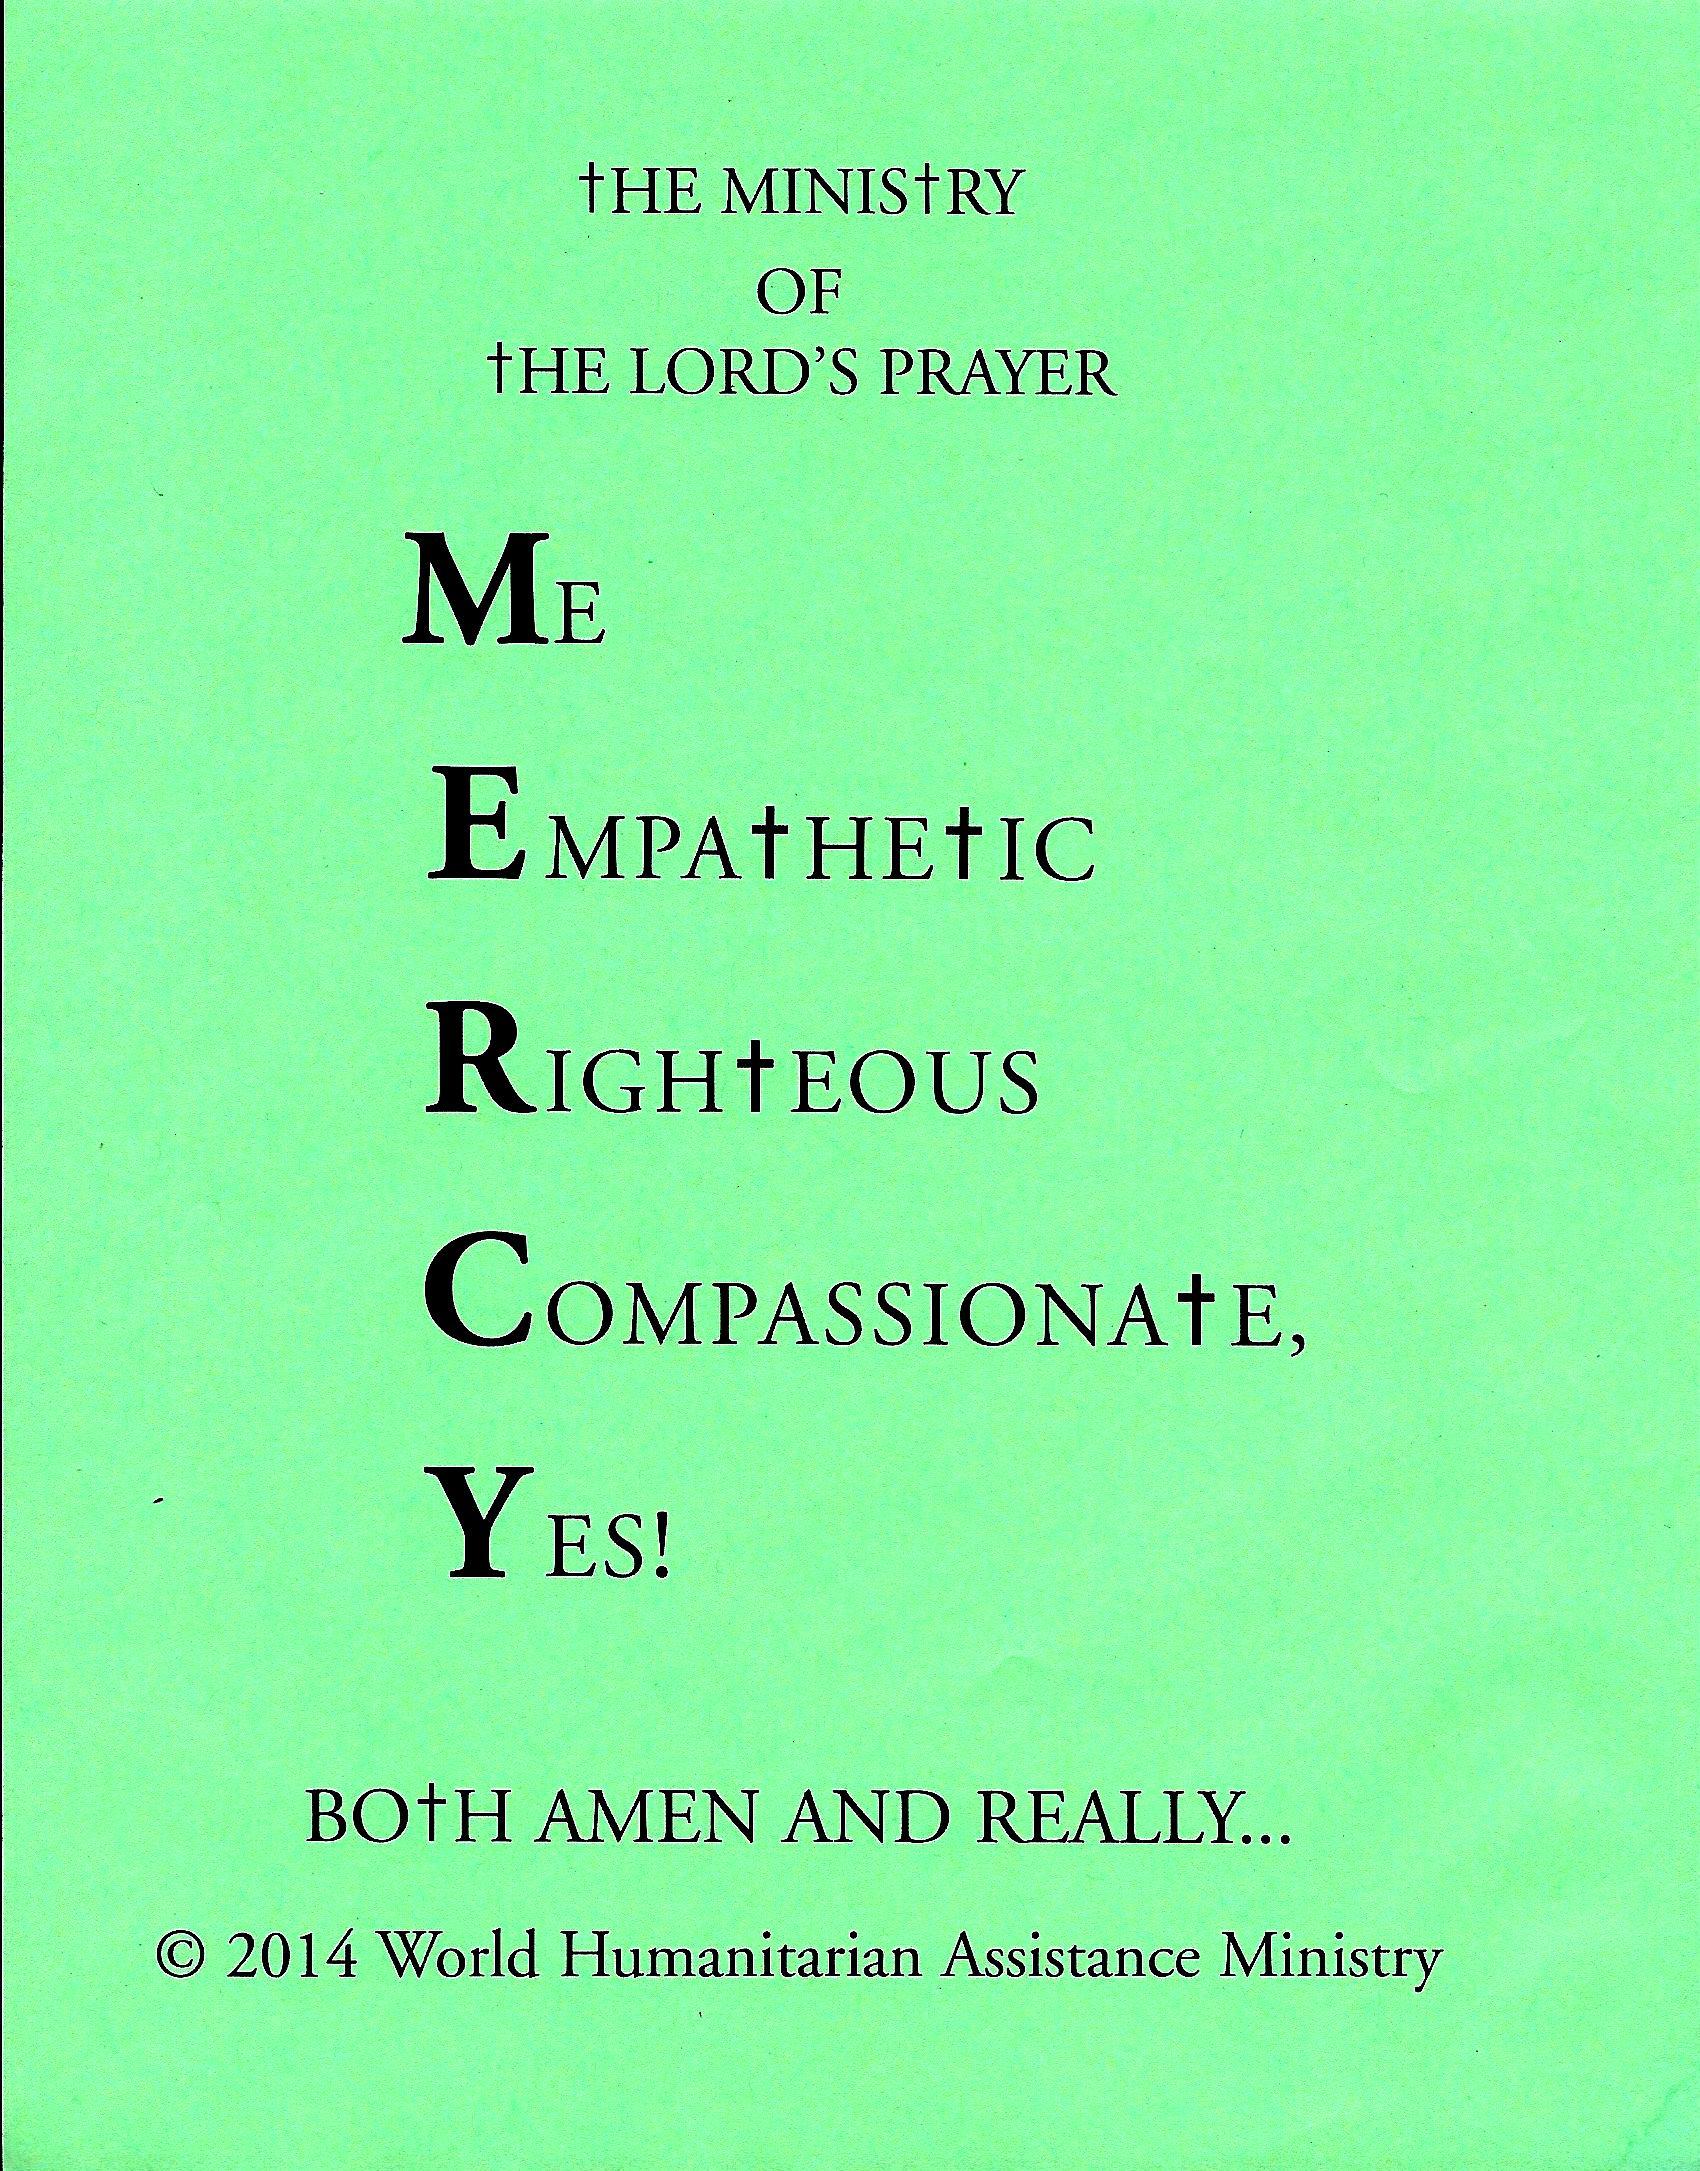 ministry of the lords prayer u2013 u2020